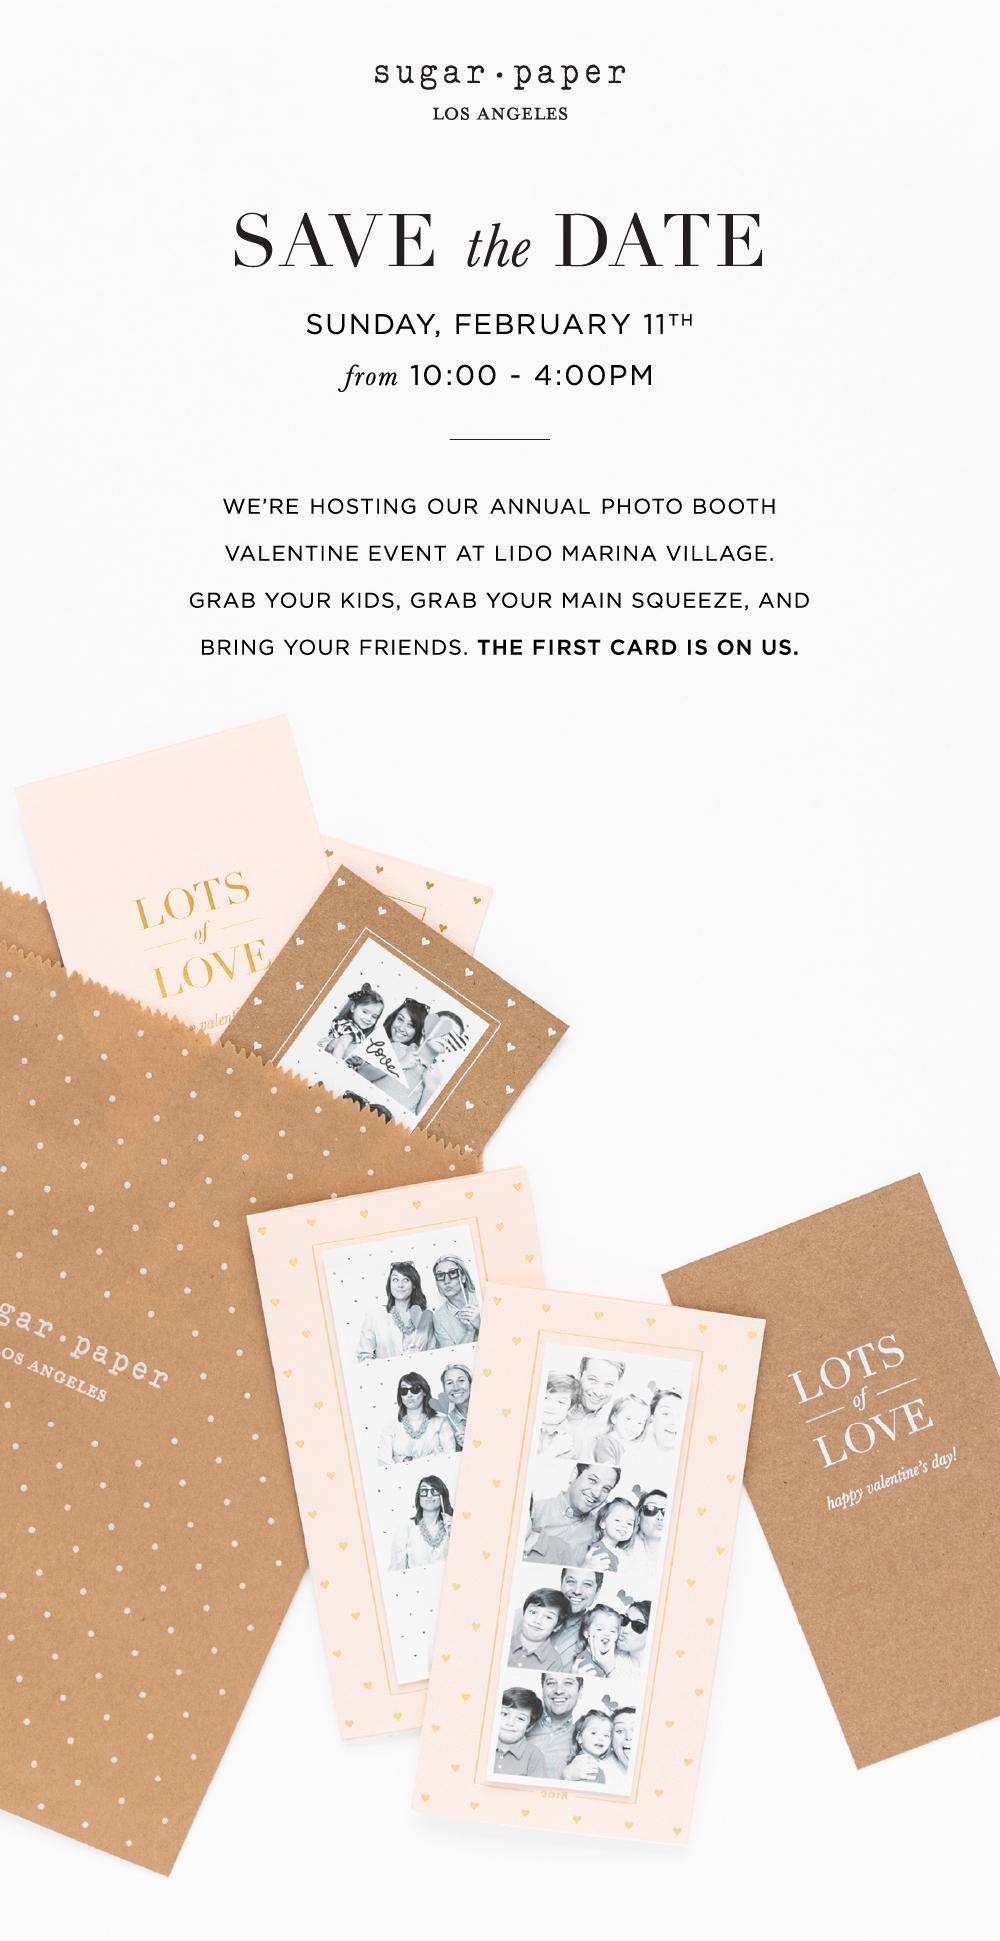 Sugar-Paper-Valentine-Photobooth-Email-NEWPORT-BEACH.JPG